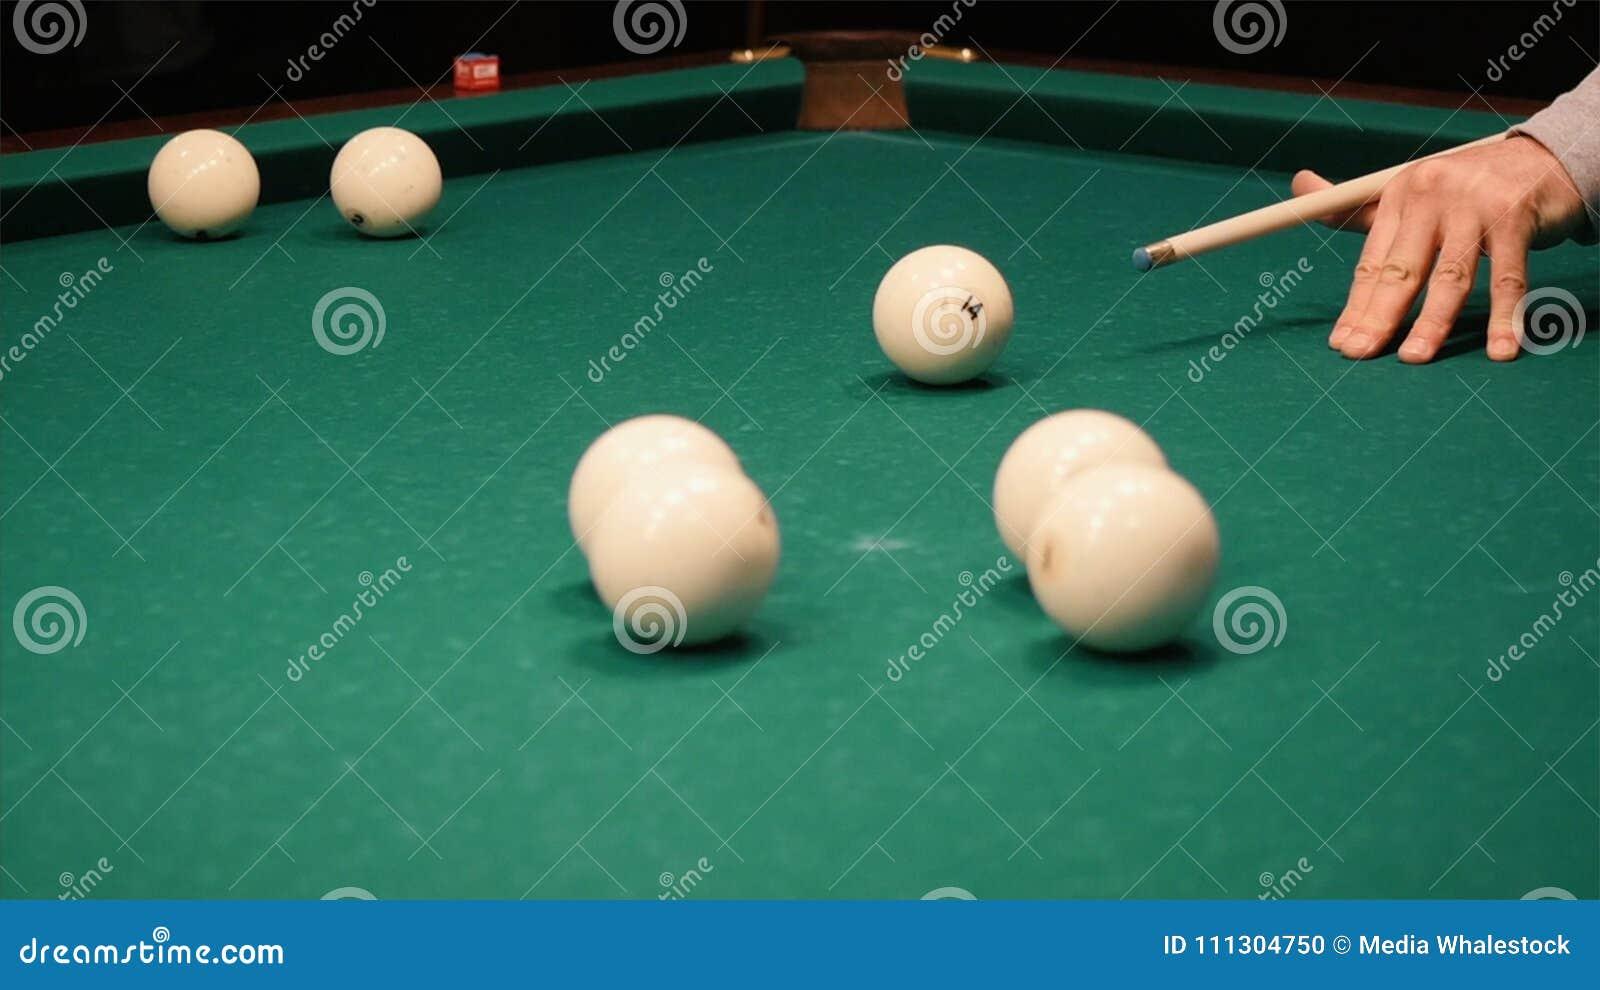 Playing billiards. Clip. Blowing a cue on the ball, the ball hit the pocket, the ball did not hit the pocket, billard